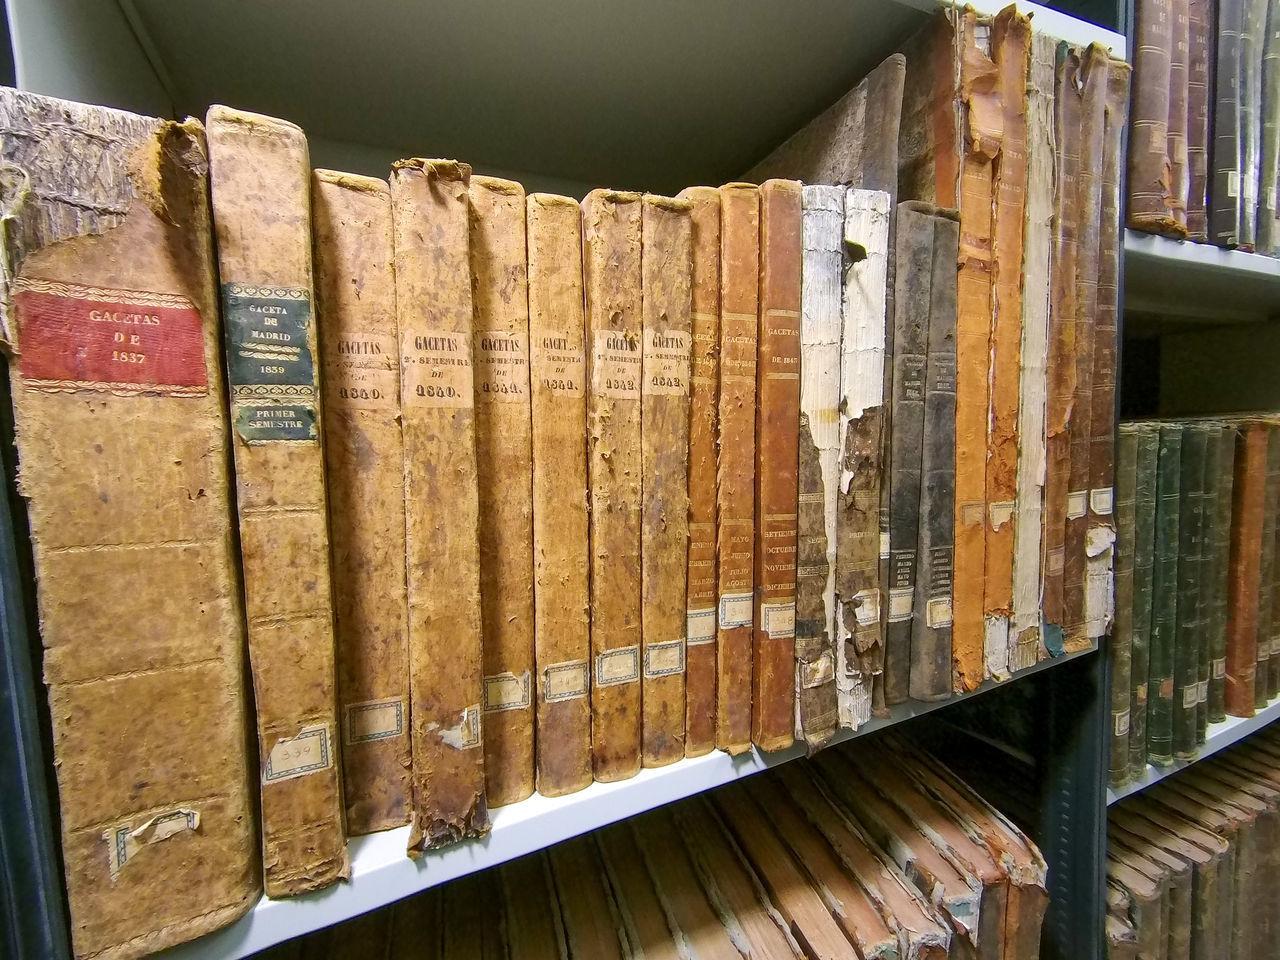 CLOSE-UP OF OLD BOOKS IN SHELF